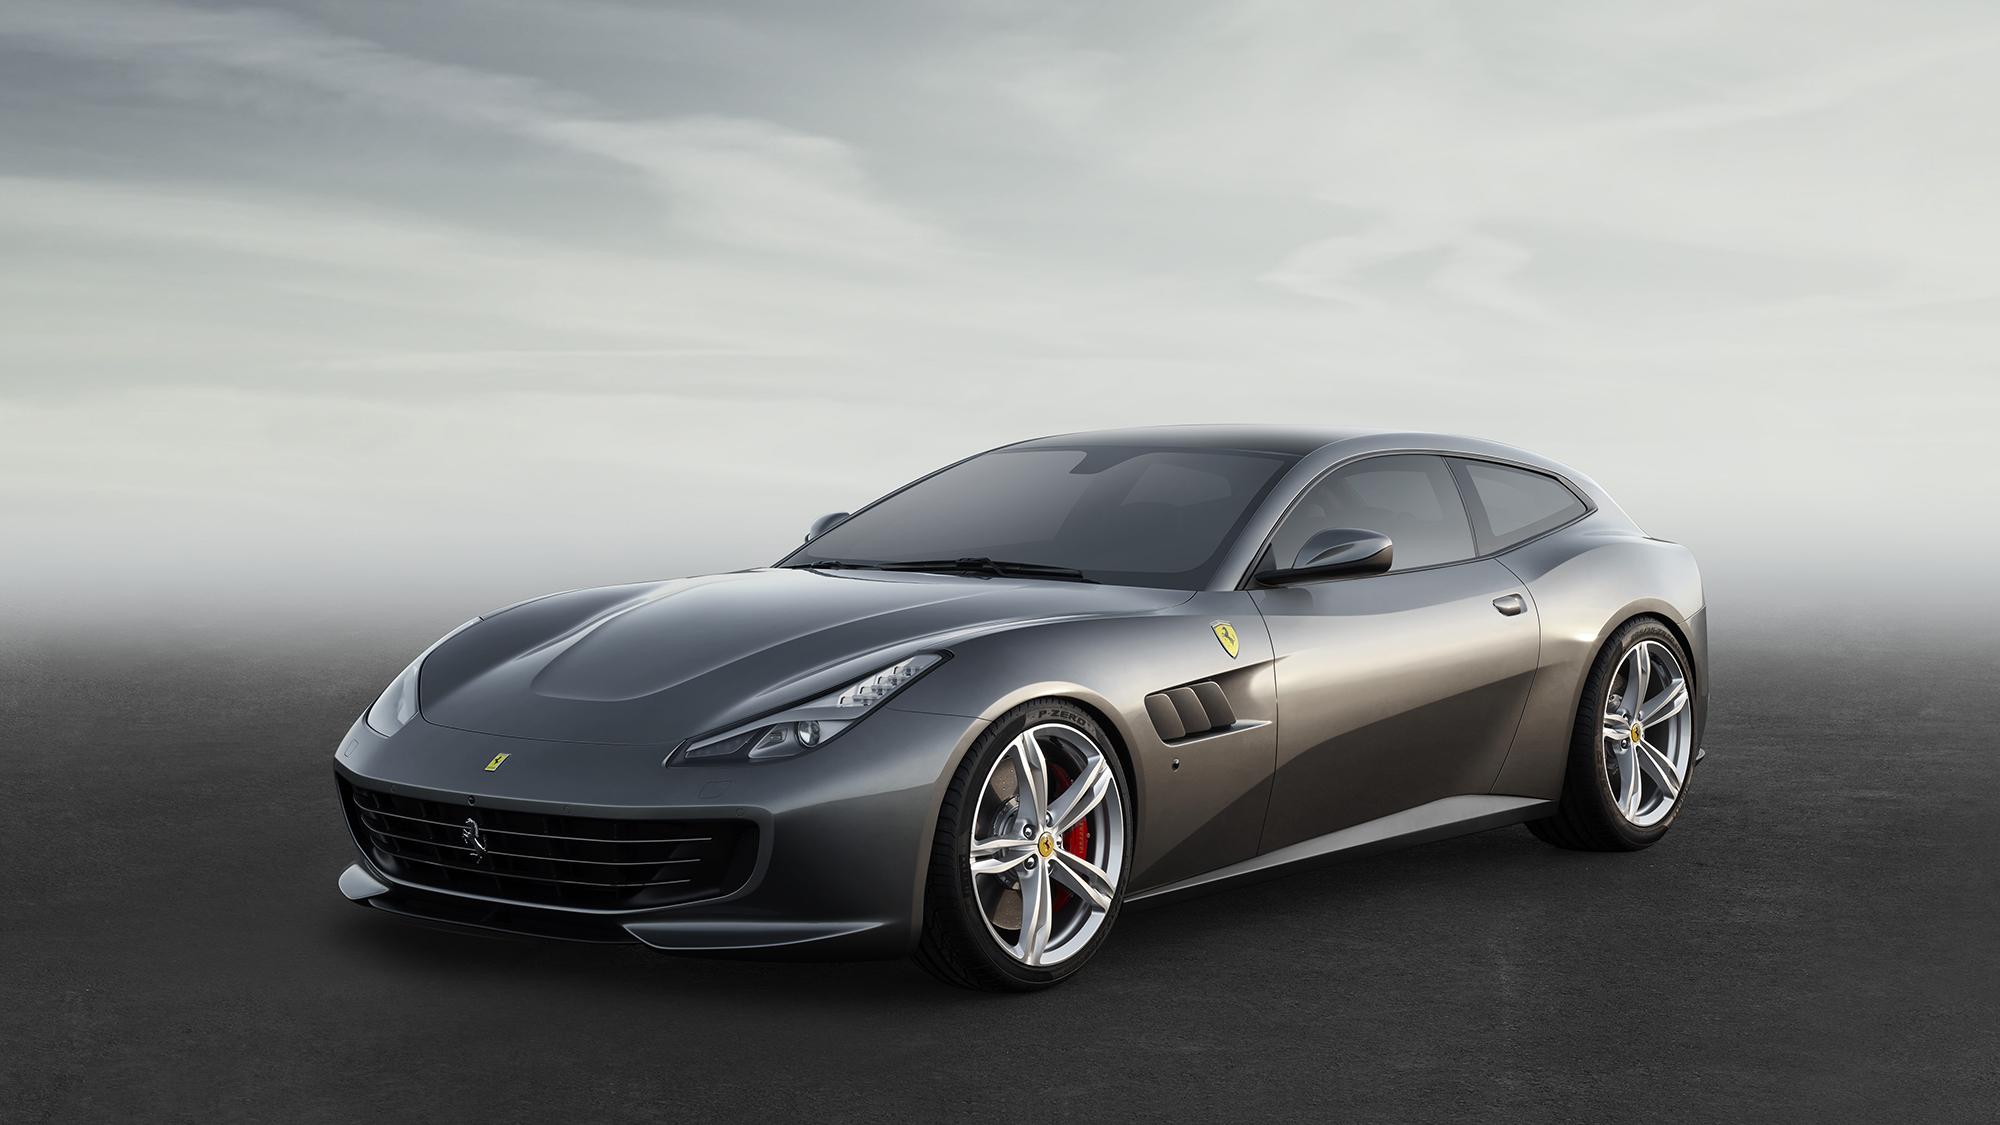 Ferrari Latest News, Photos & Videos | WIRED